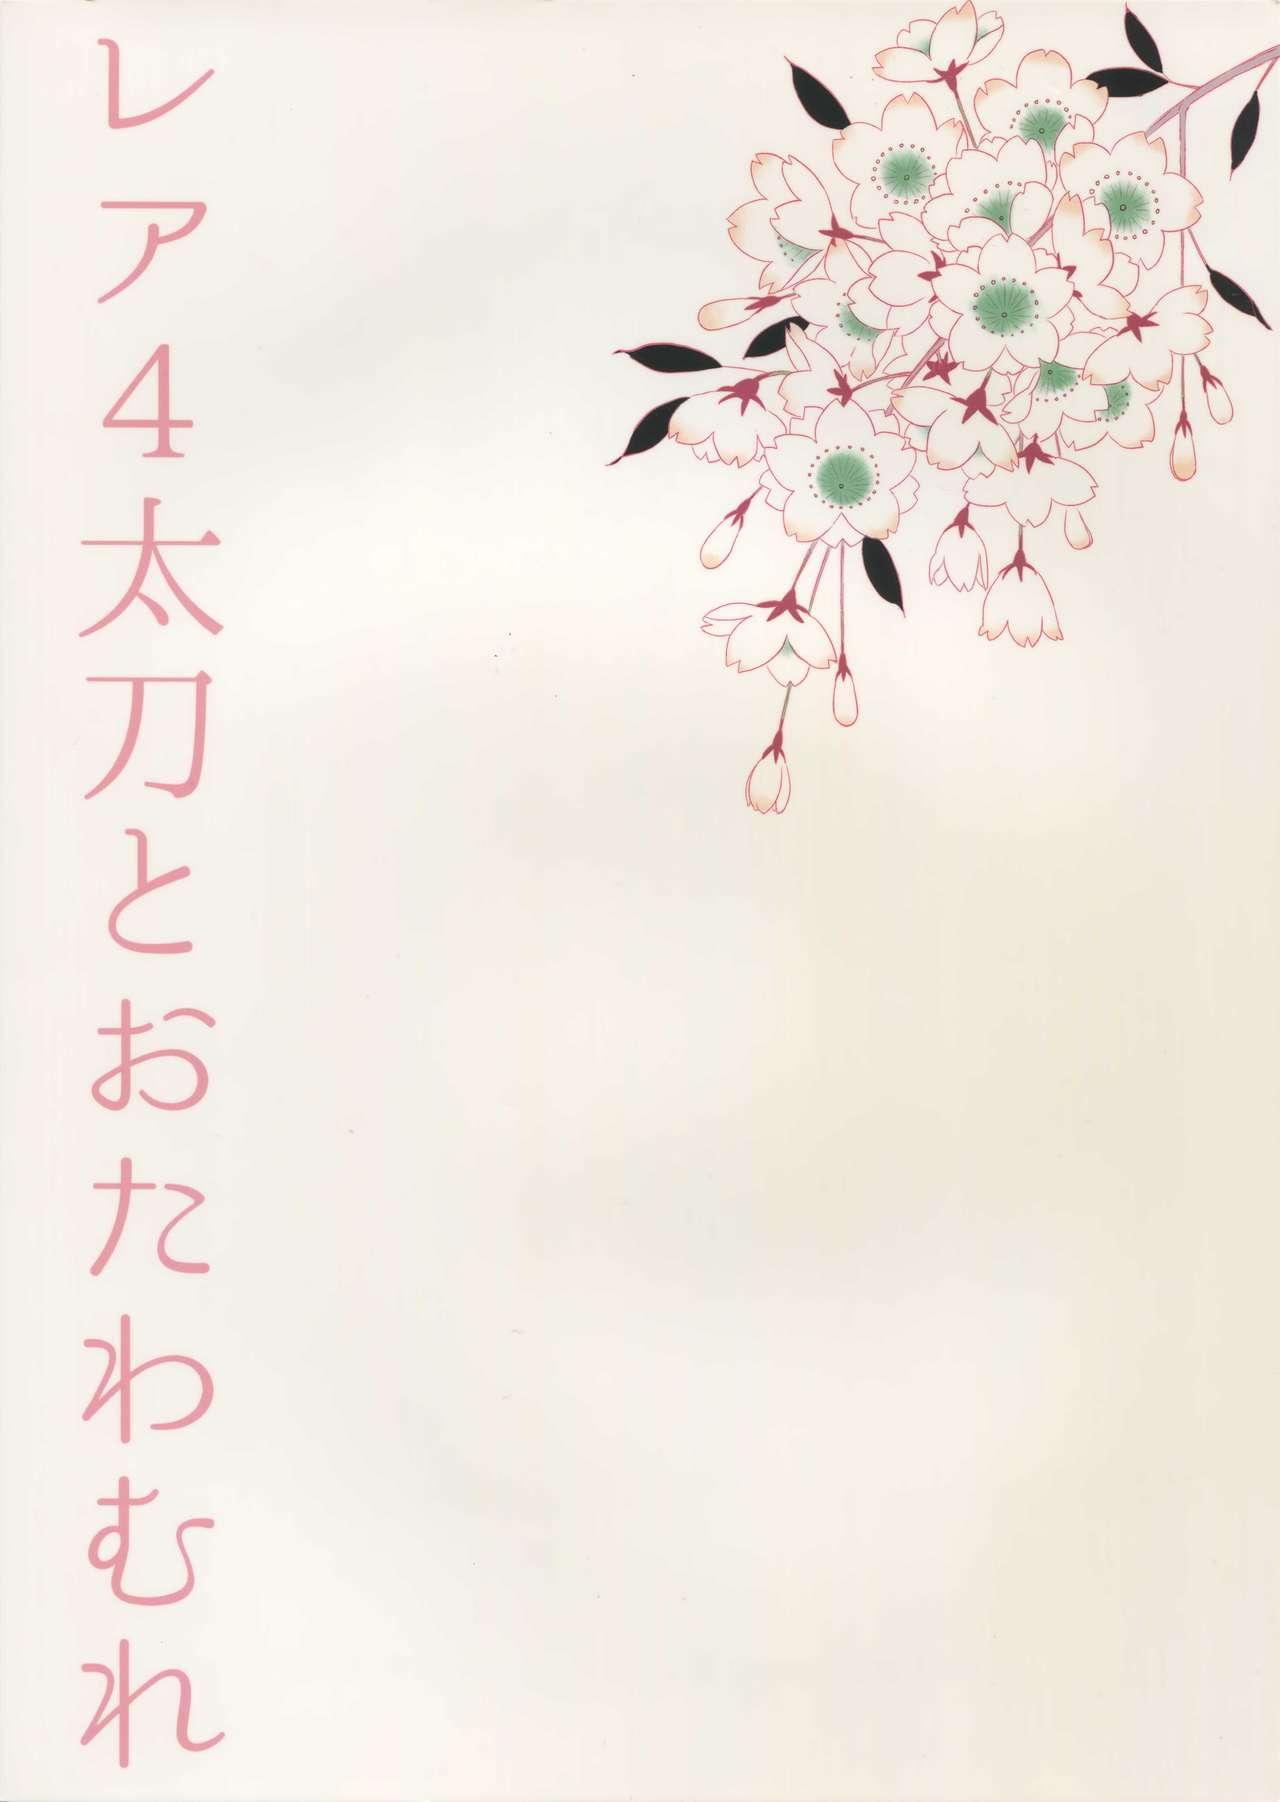 Rare 4 Tachi to Otawamure 29